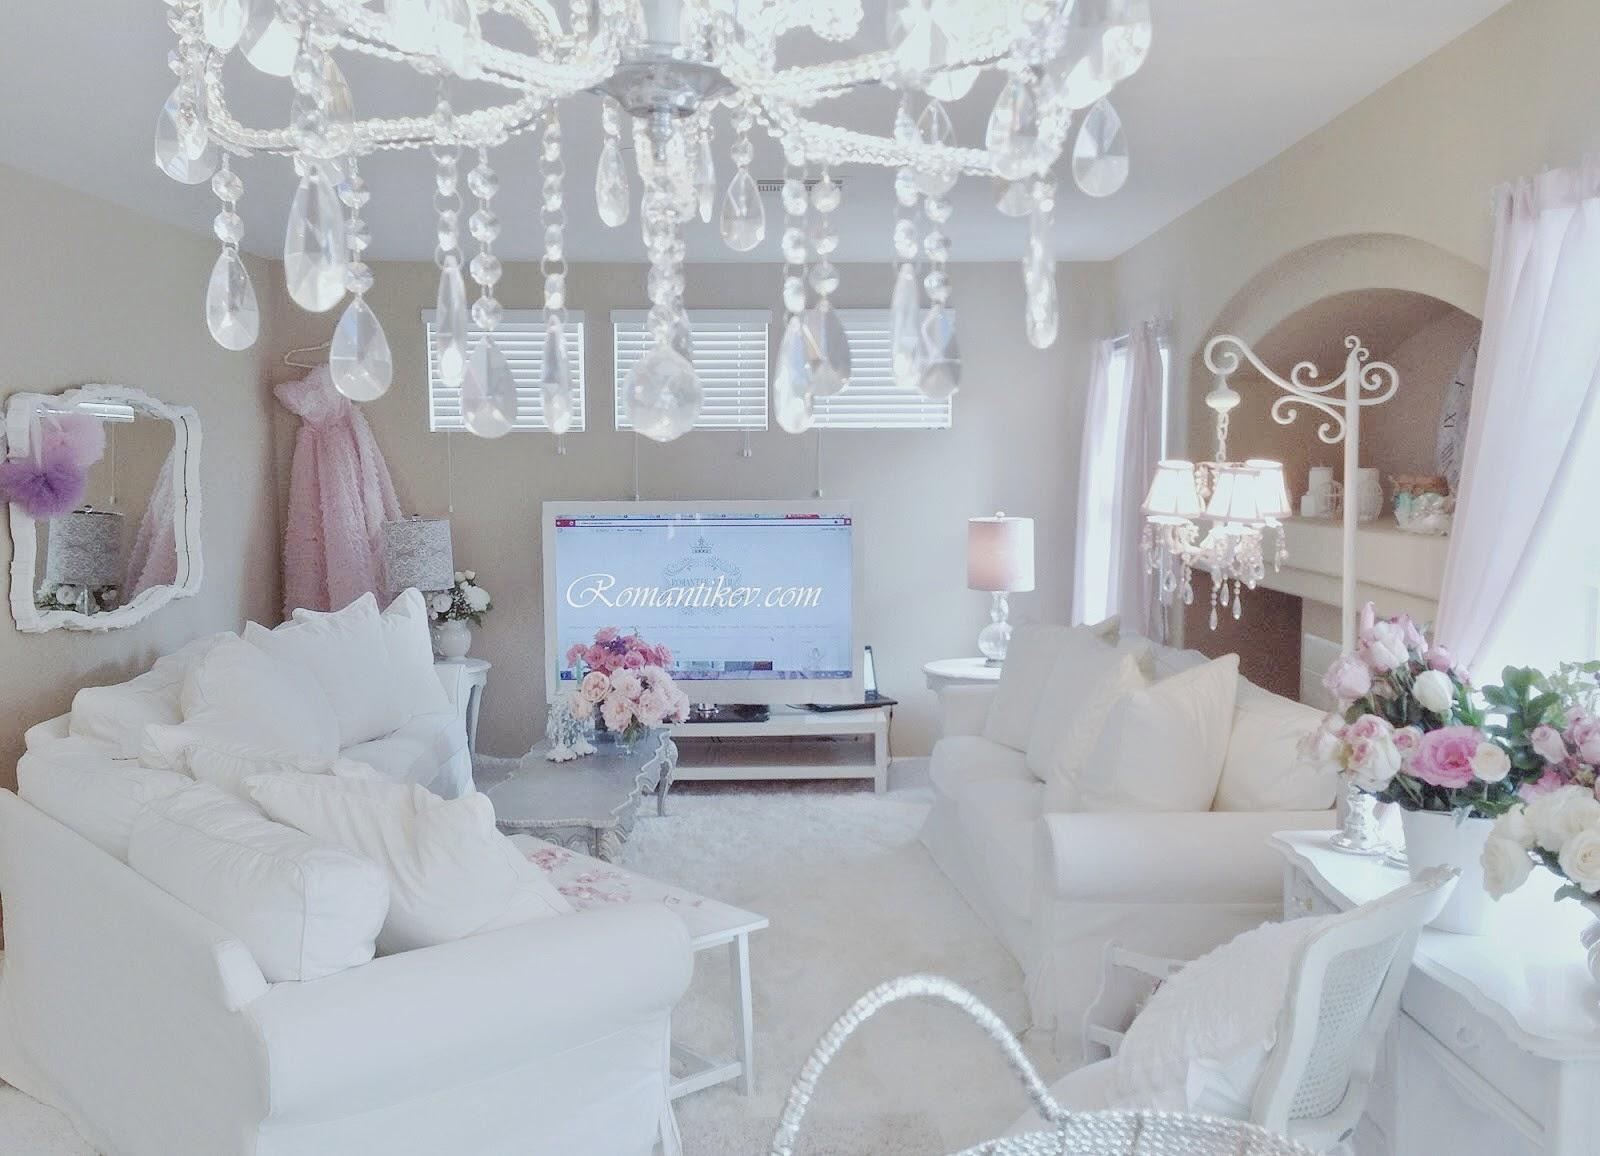 Romantic shabby chic home romantic shabby chic blog - Romantic Shabby Chic Breathtaking Love